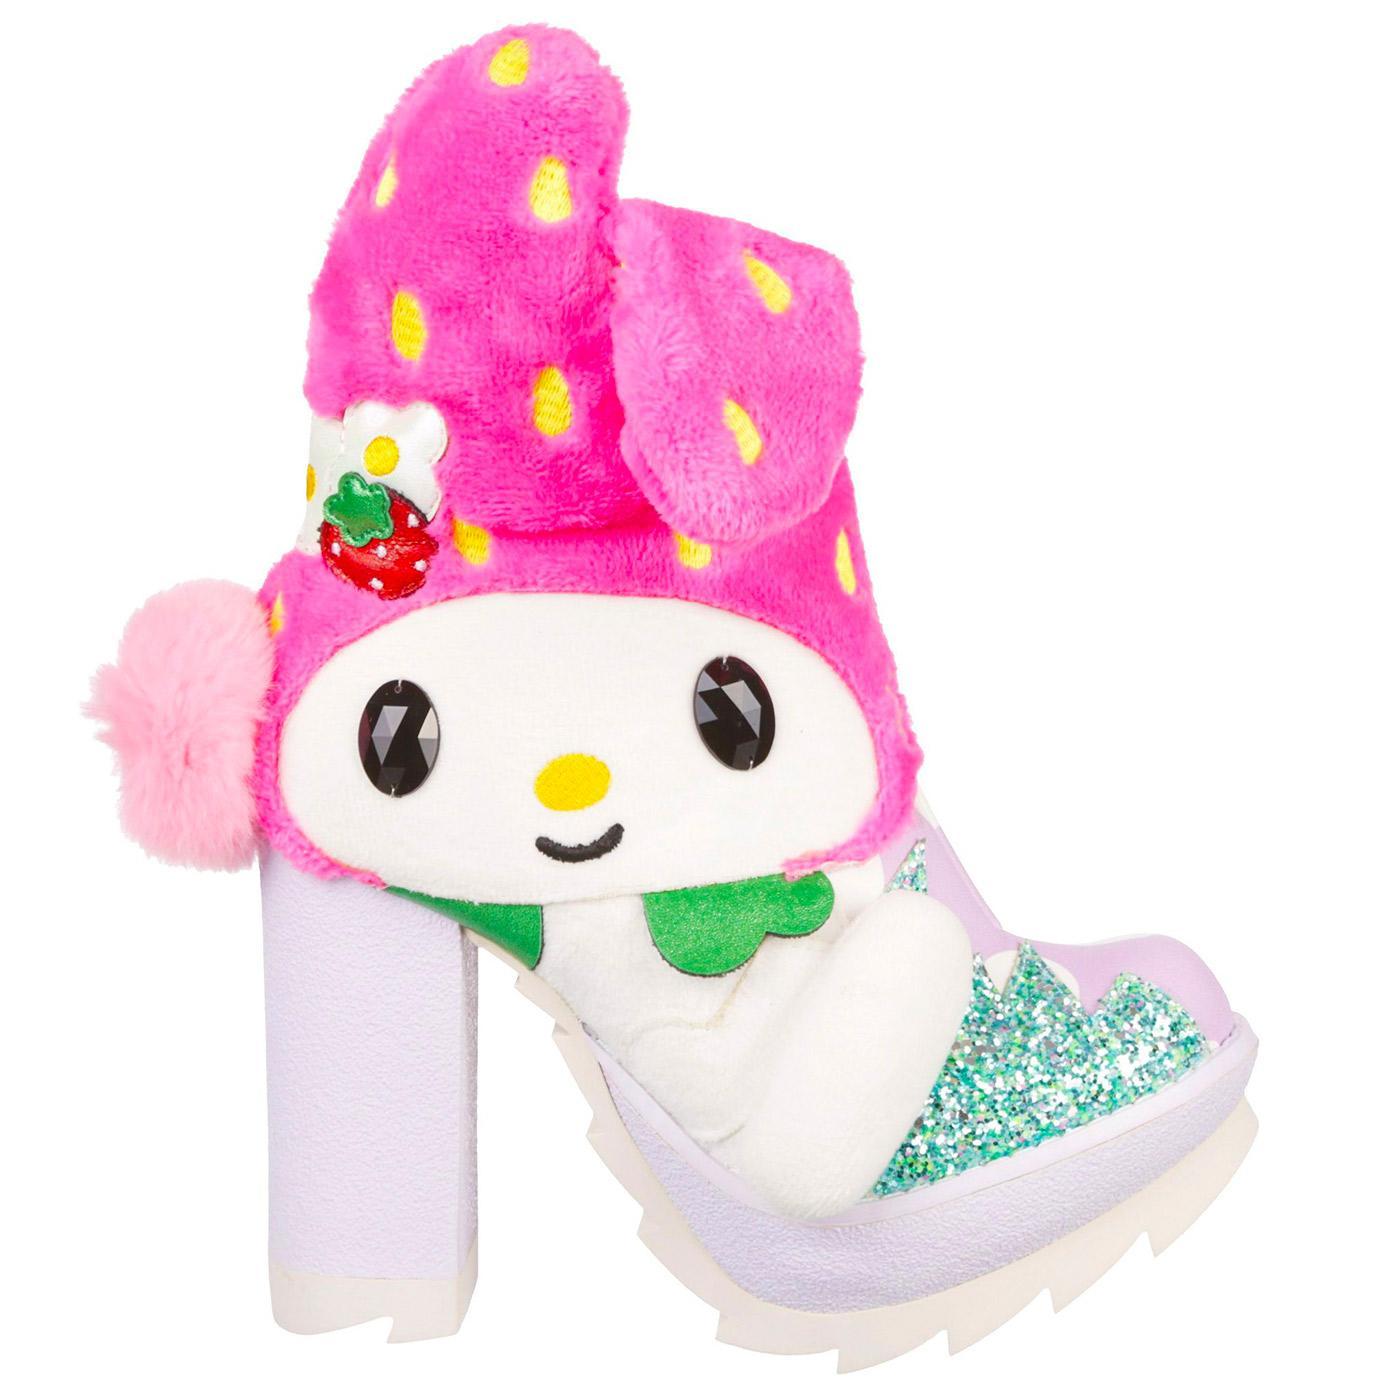 IC x HELLO KITTY Everyone Loves You Heels